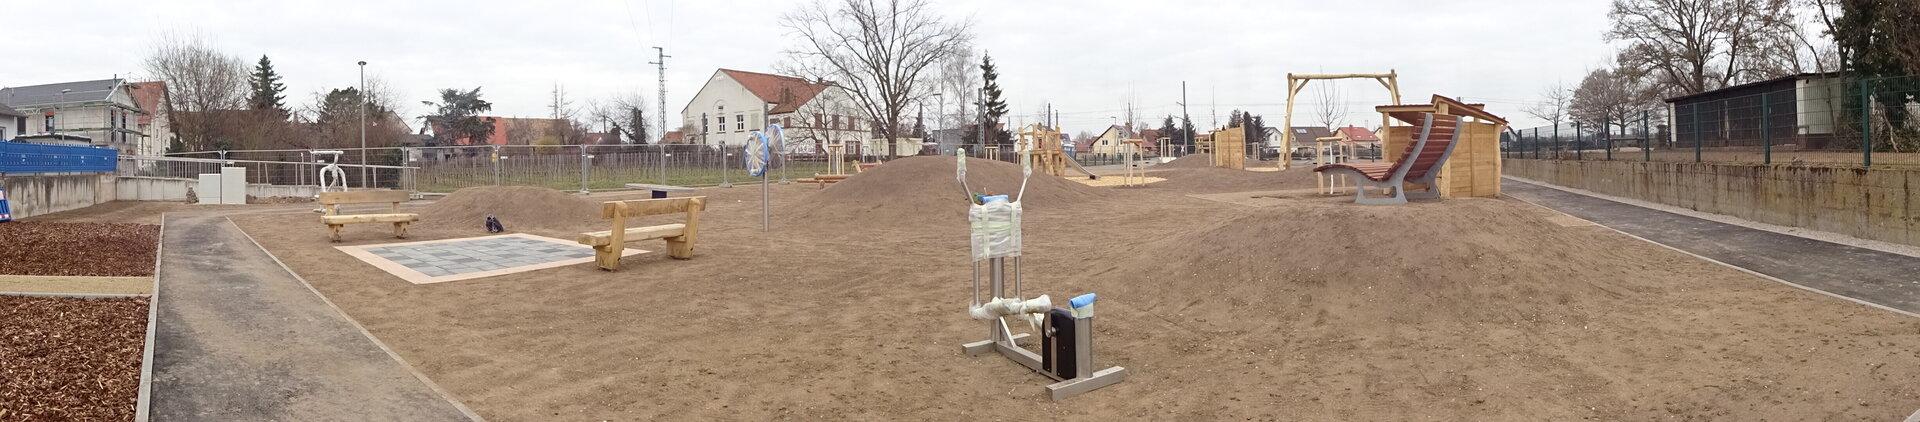 Generationenplatz Ellerstadt